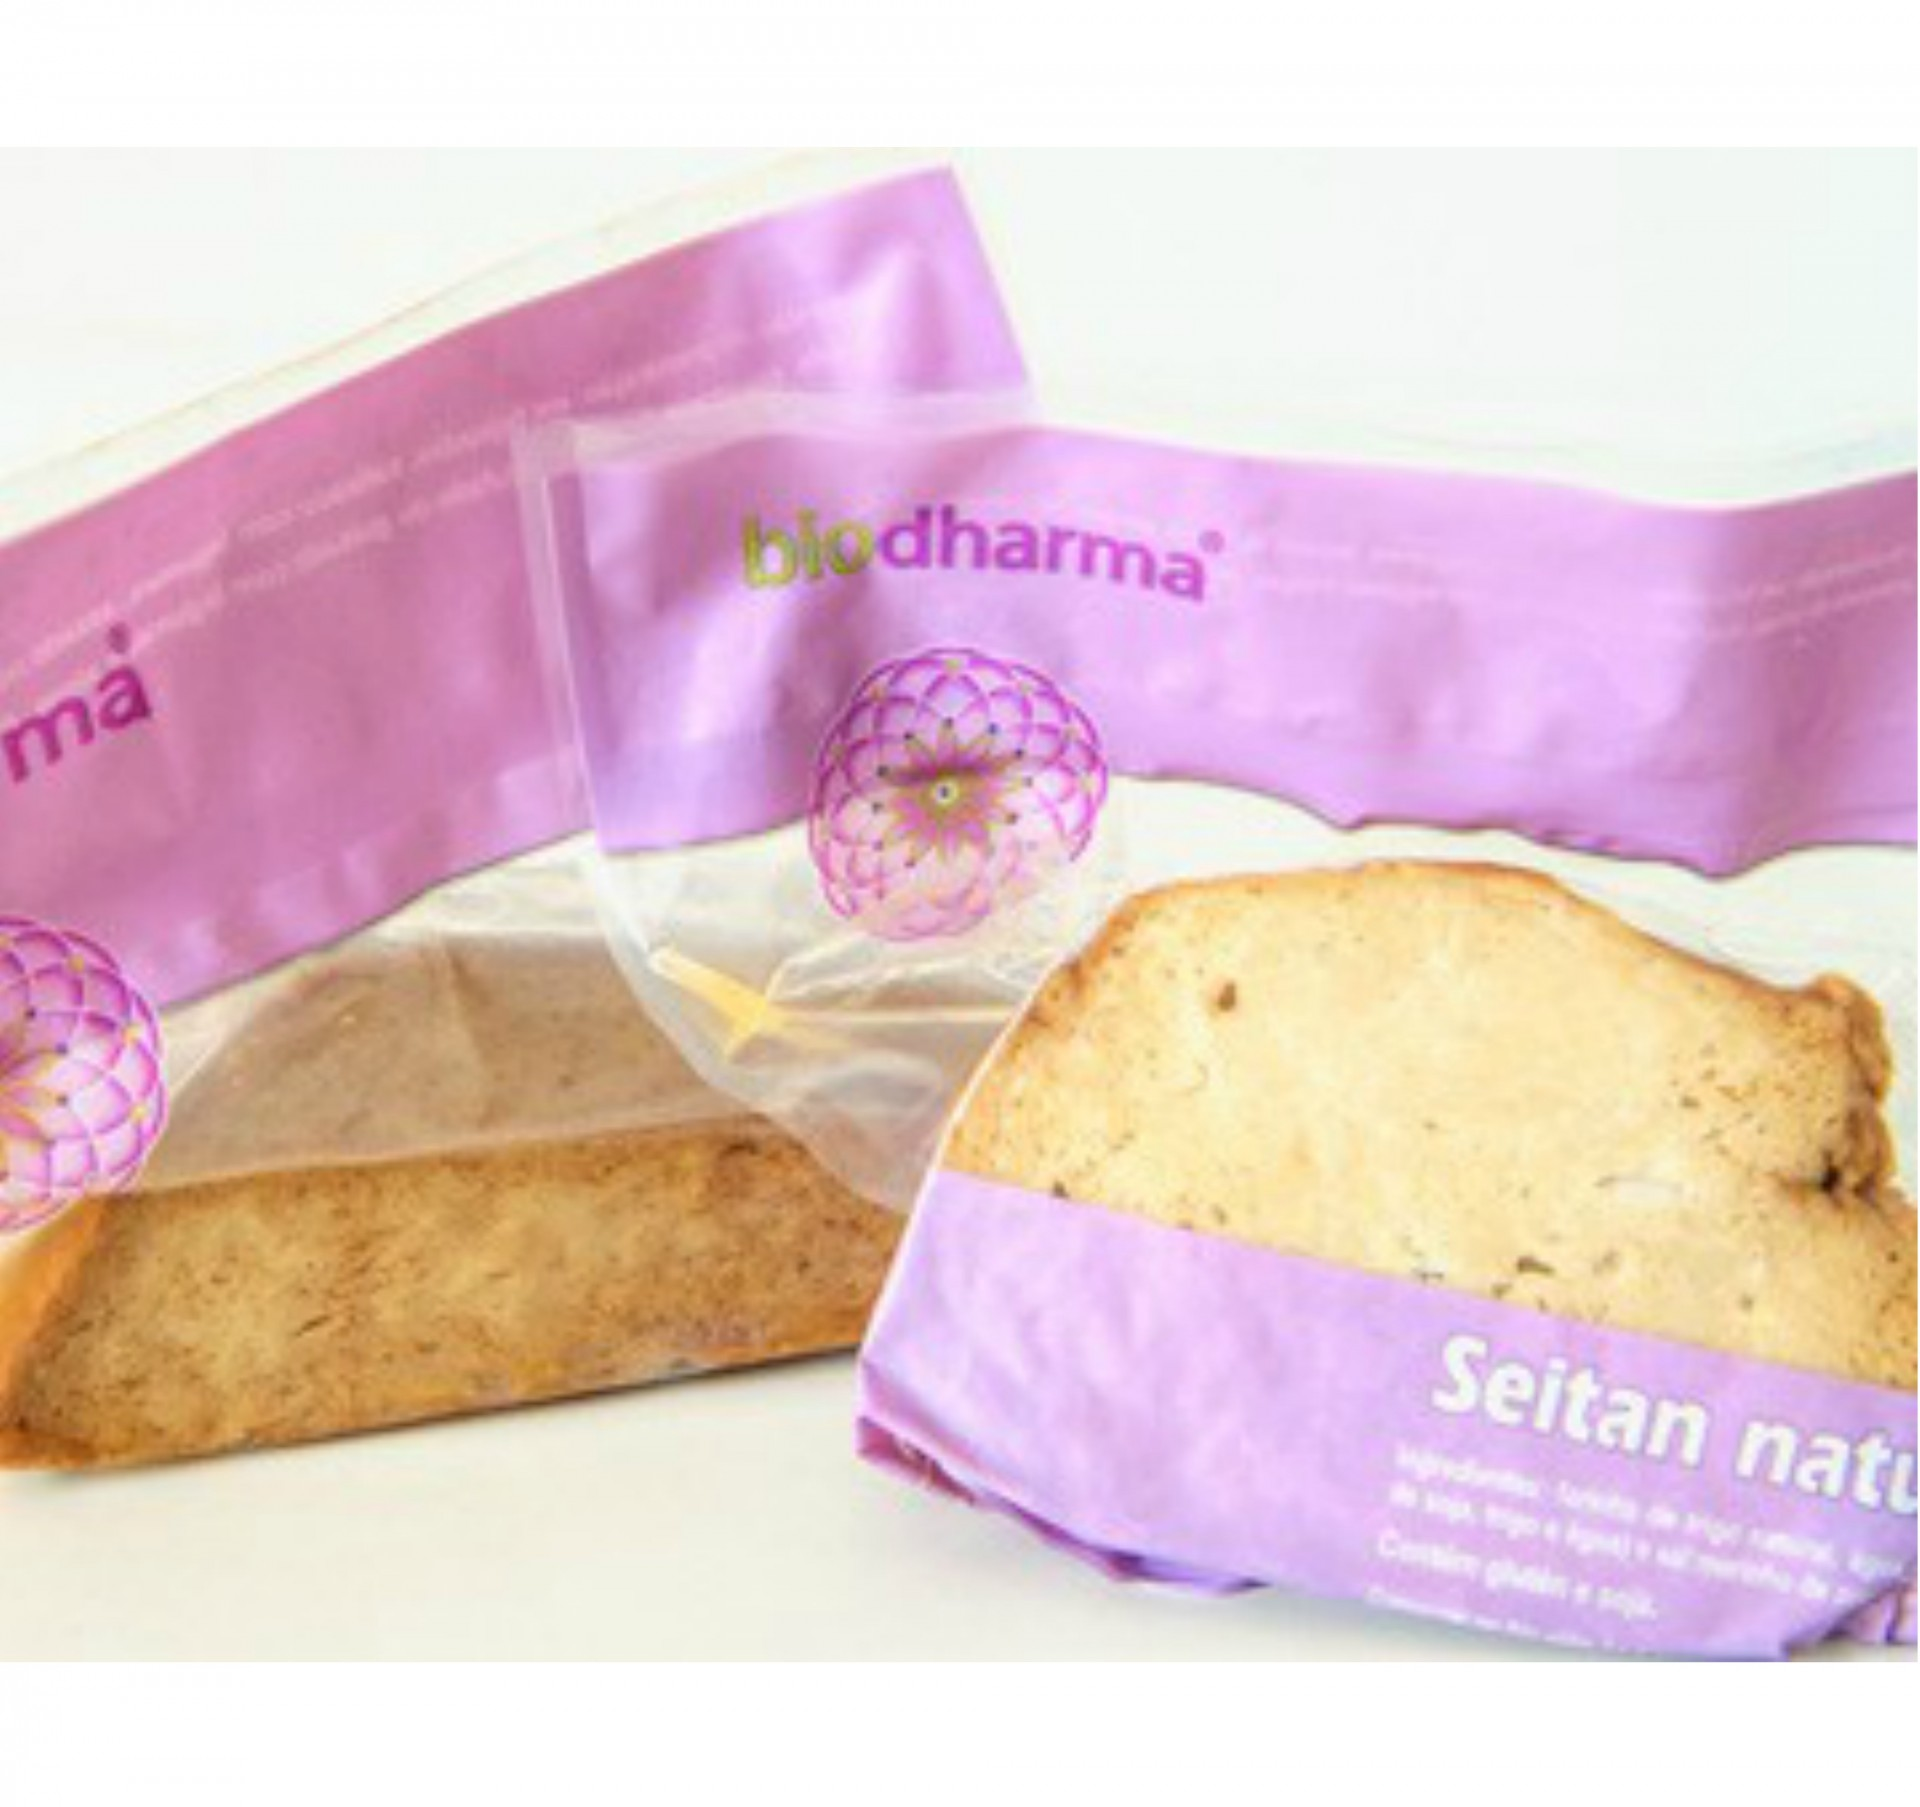 Seitan Natural 500 grs | Biodharma